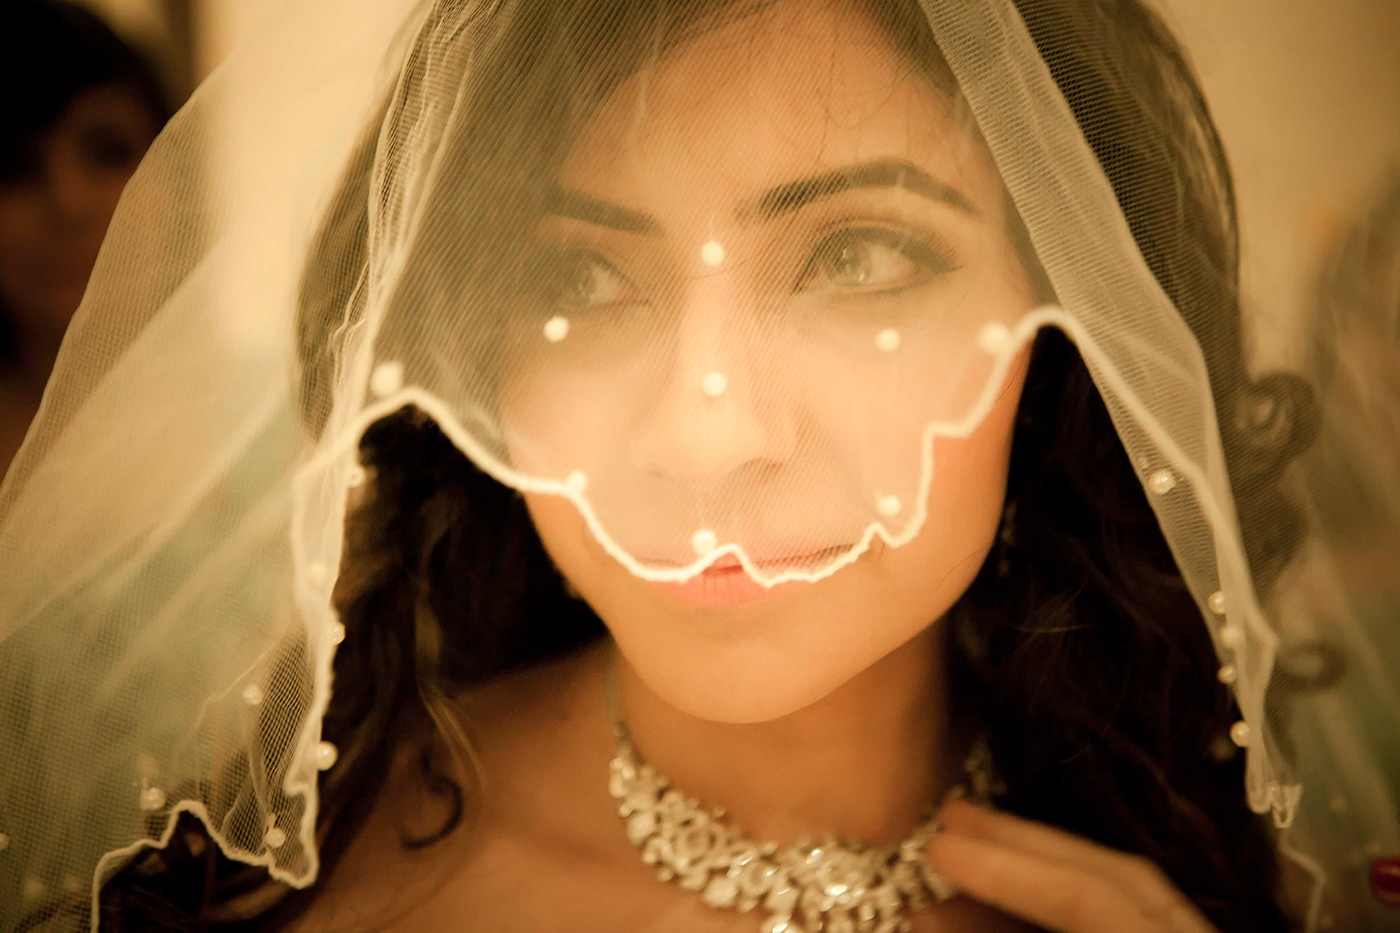 Wedding Photography destination wedding WEDDING PHOTOGRAPHER BANGALORE BANGALORE WEDDING PHOTOGRAPHY Top Wedding Photographer indian wedding photography indian wedding photographer bangalore wedding photographer